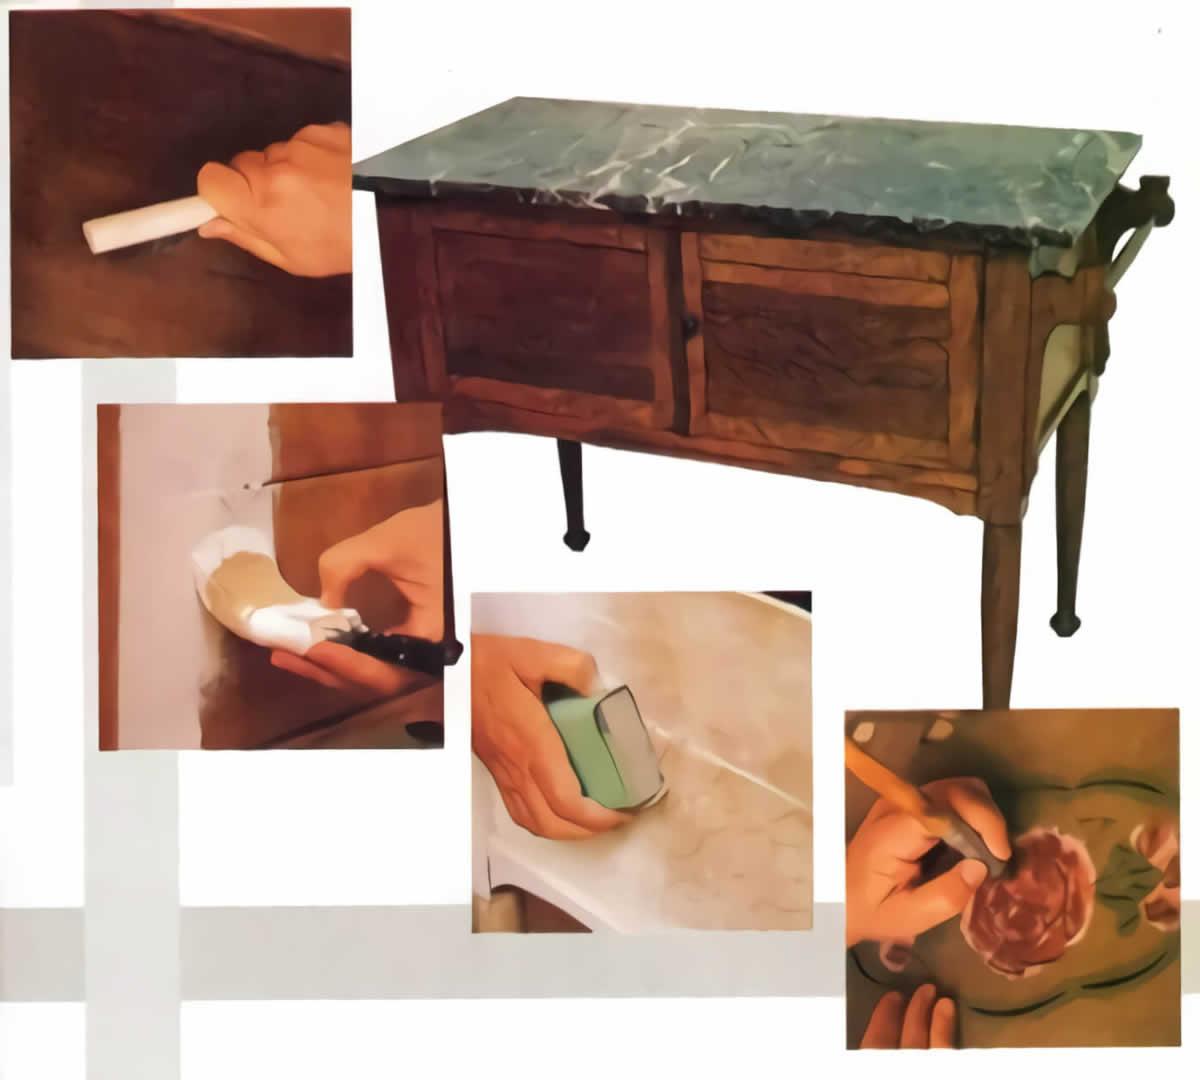 3 Técnicas para restaurar muebles Esmihobby